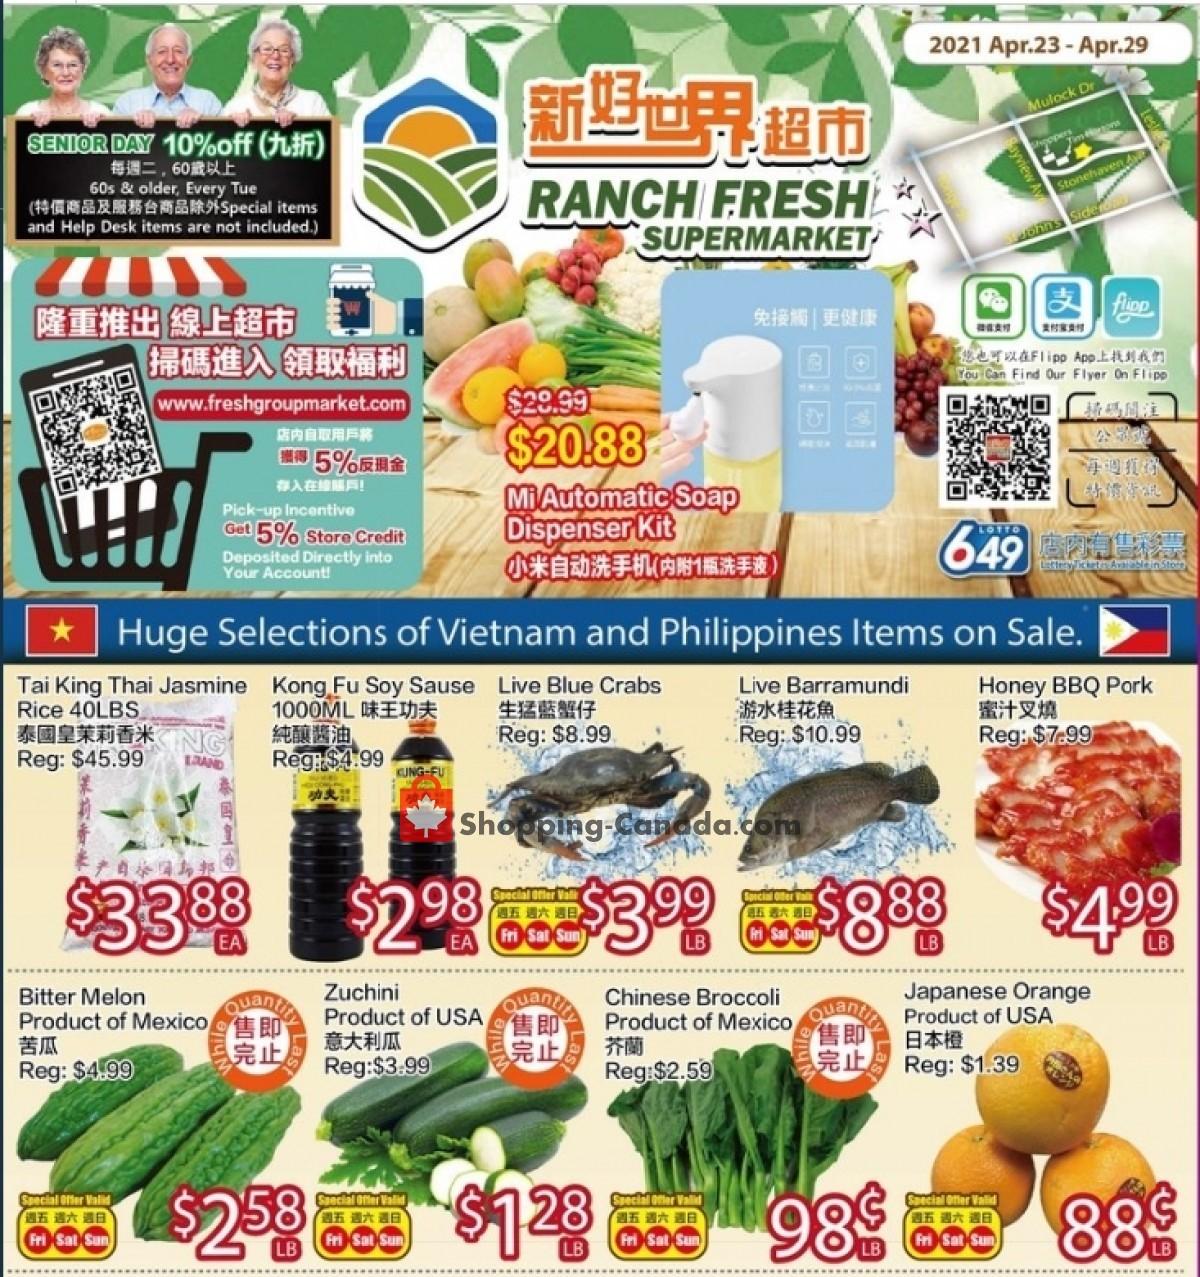 Ranch Fresh Supermarket Flyer Apr 23